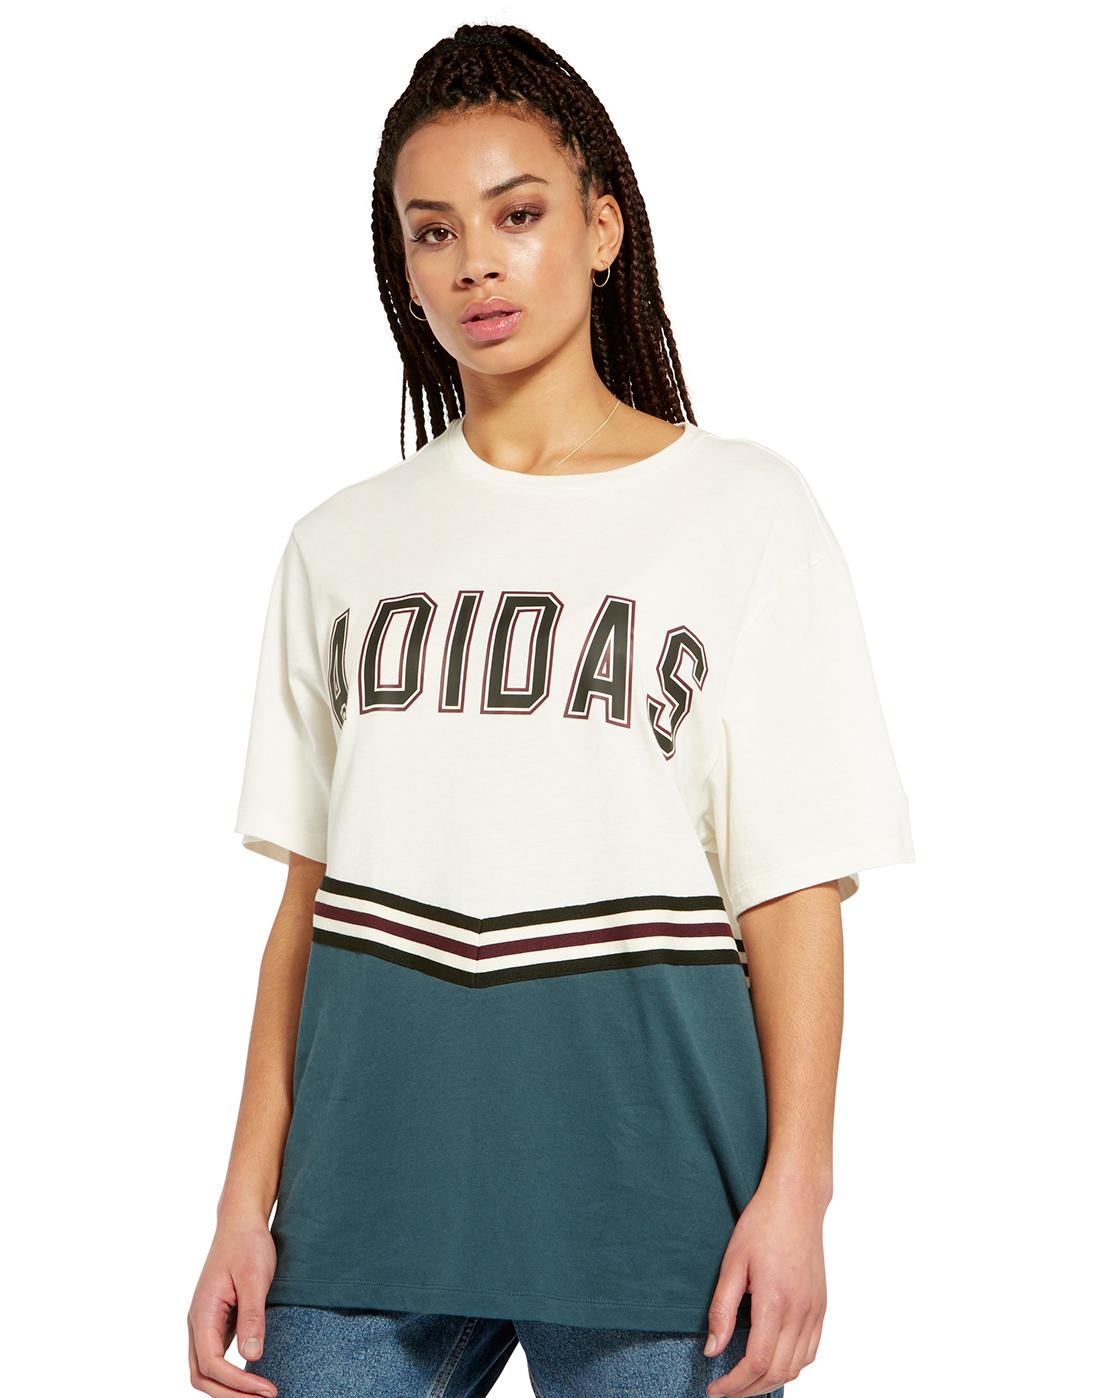 e462a56d314 adidas Originals Womens Adibreak SS T-Shirt | Life Style Sports